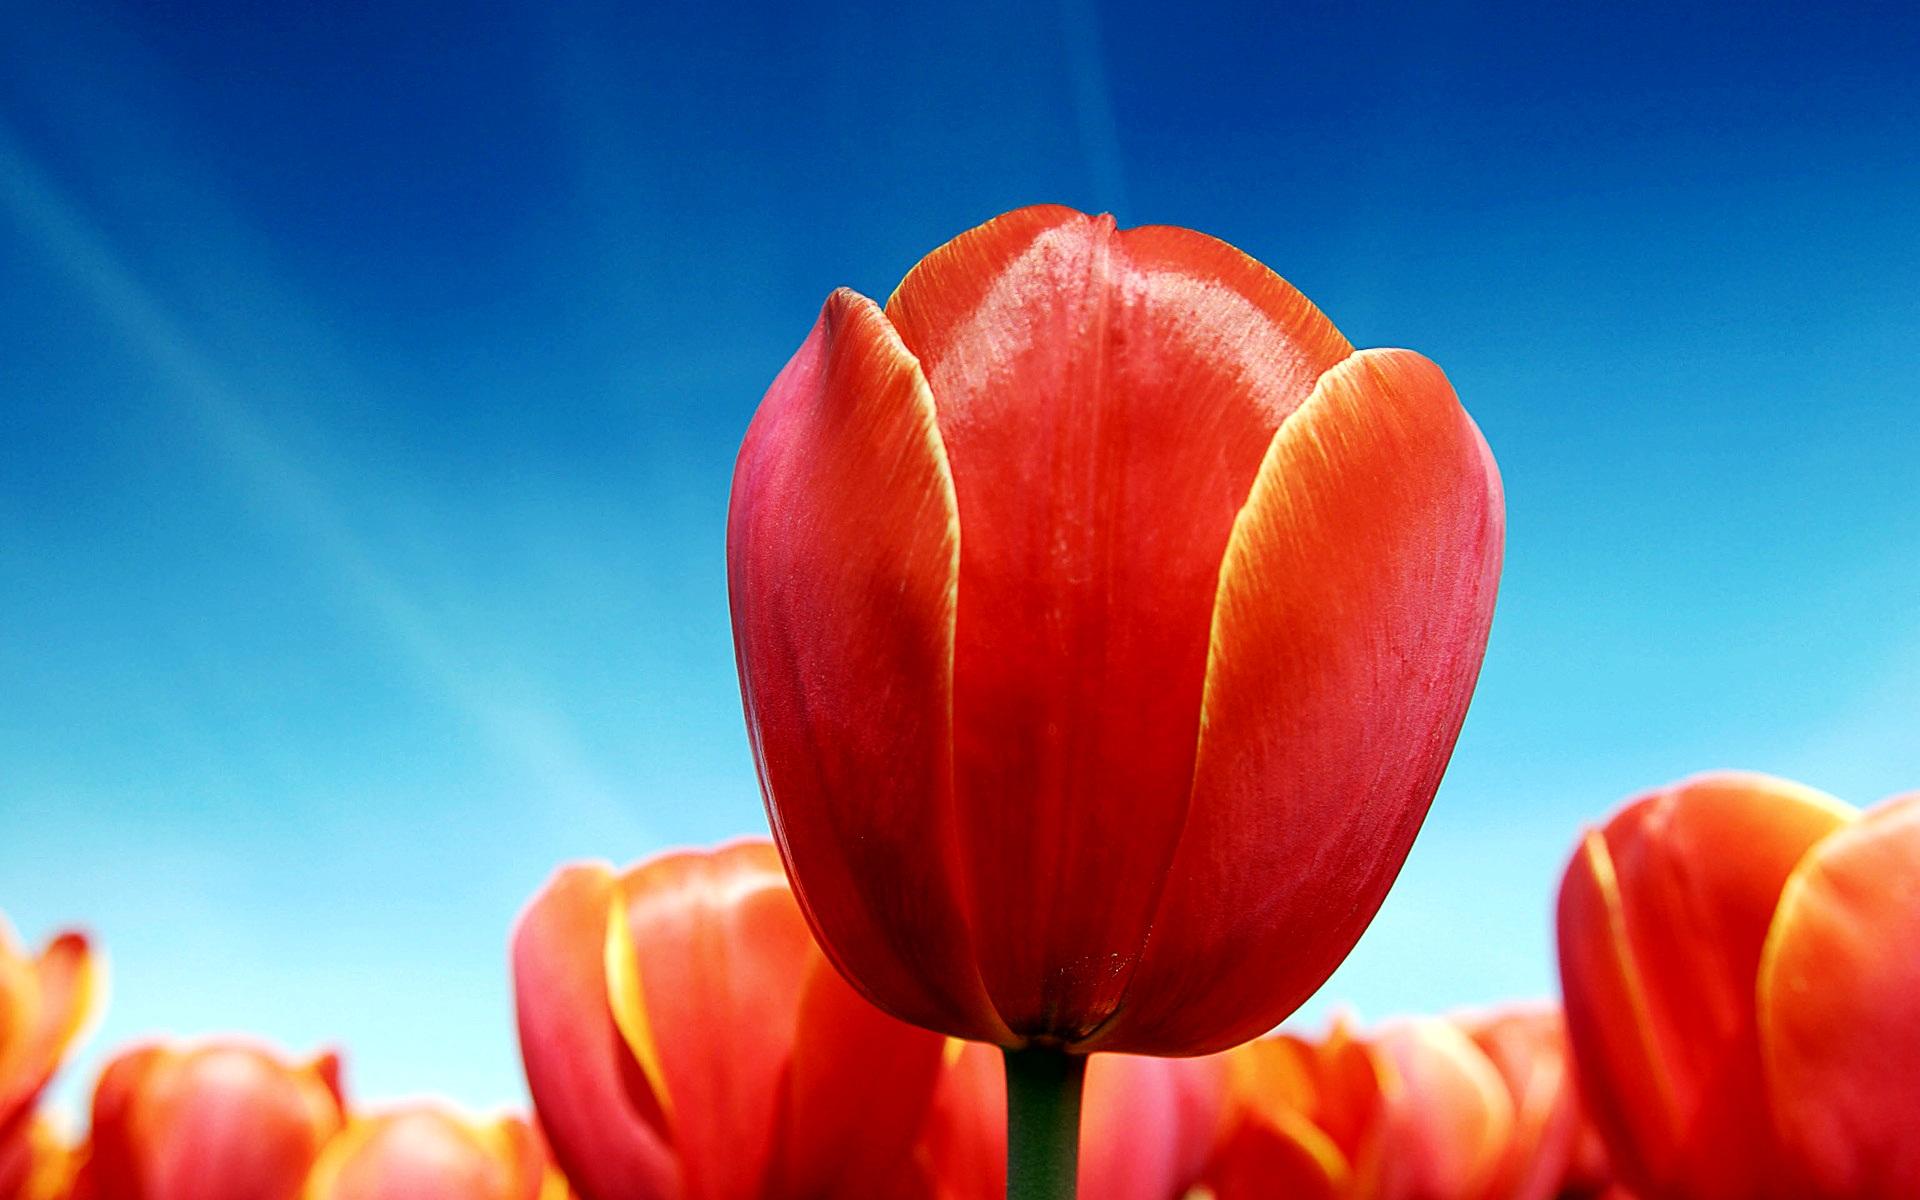 10 Tulips Flower Wallpaper For Your Desktop Background